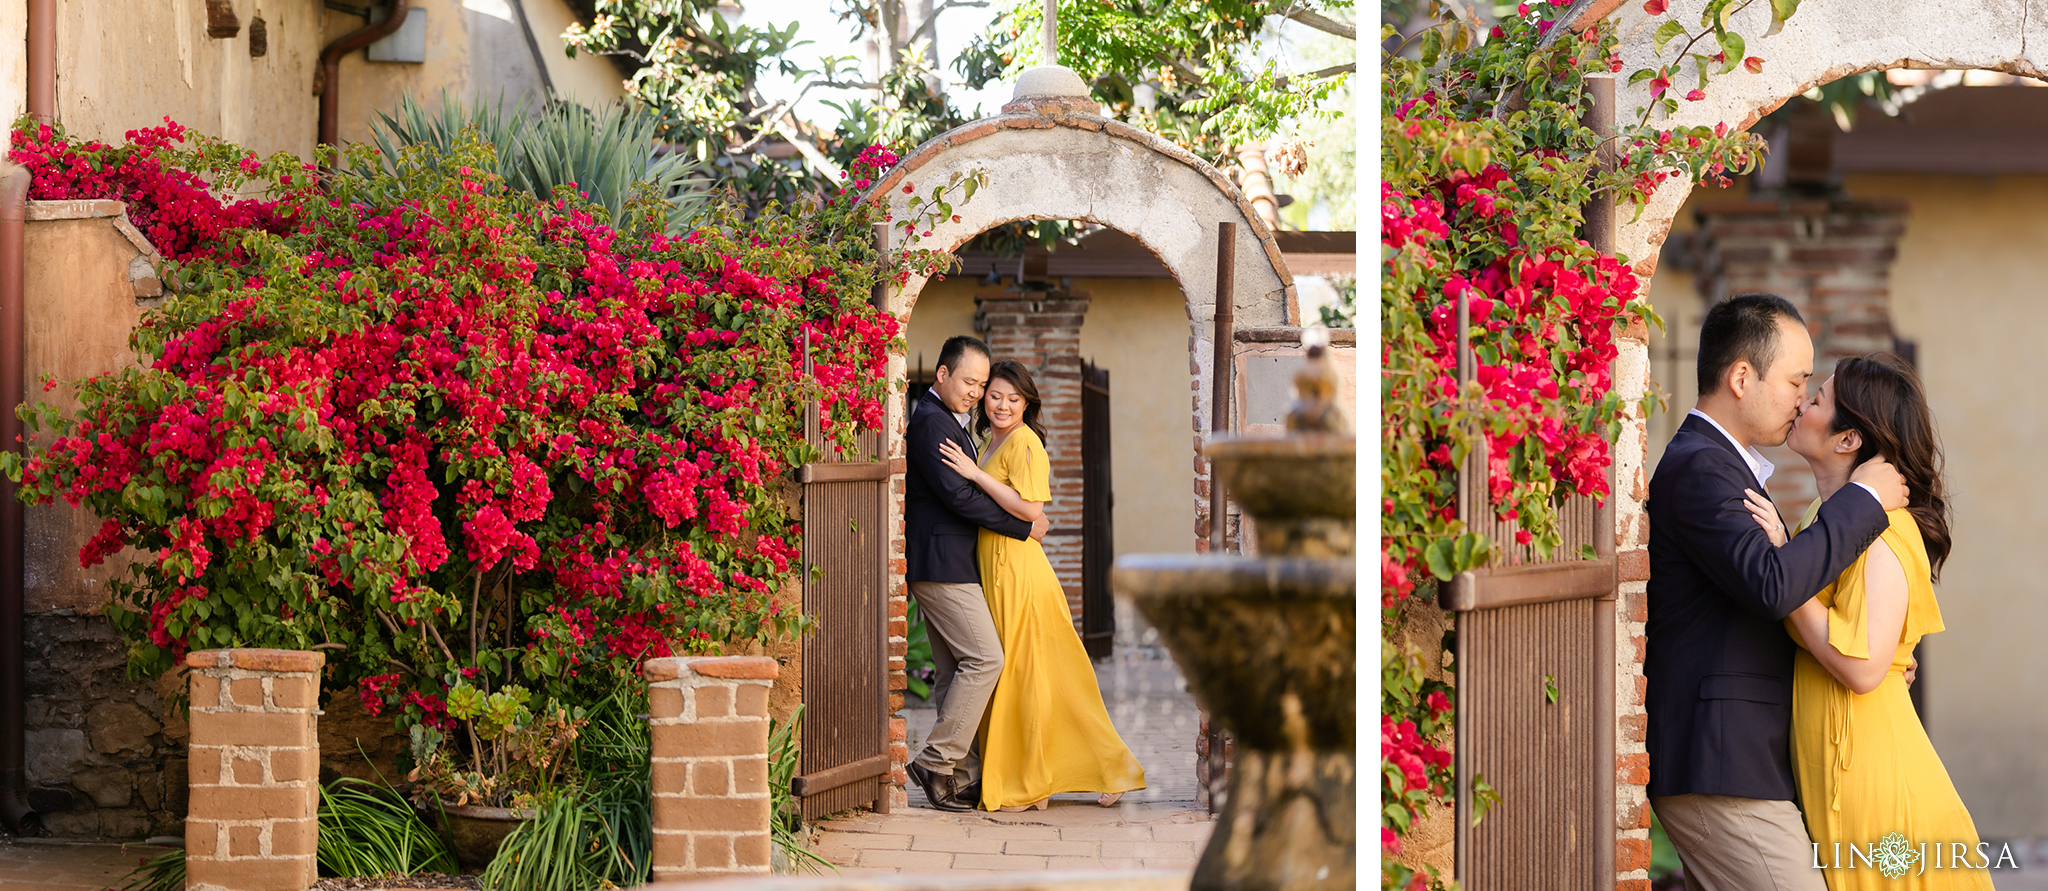 07 Mission San Juan Capistrano Engagement Photography